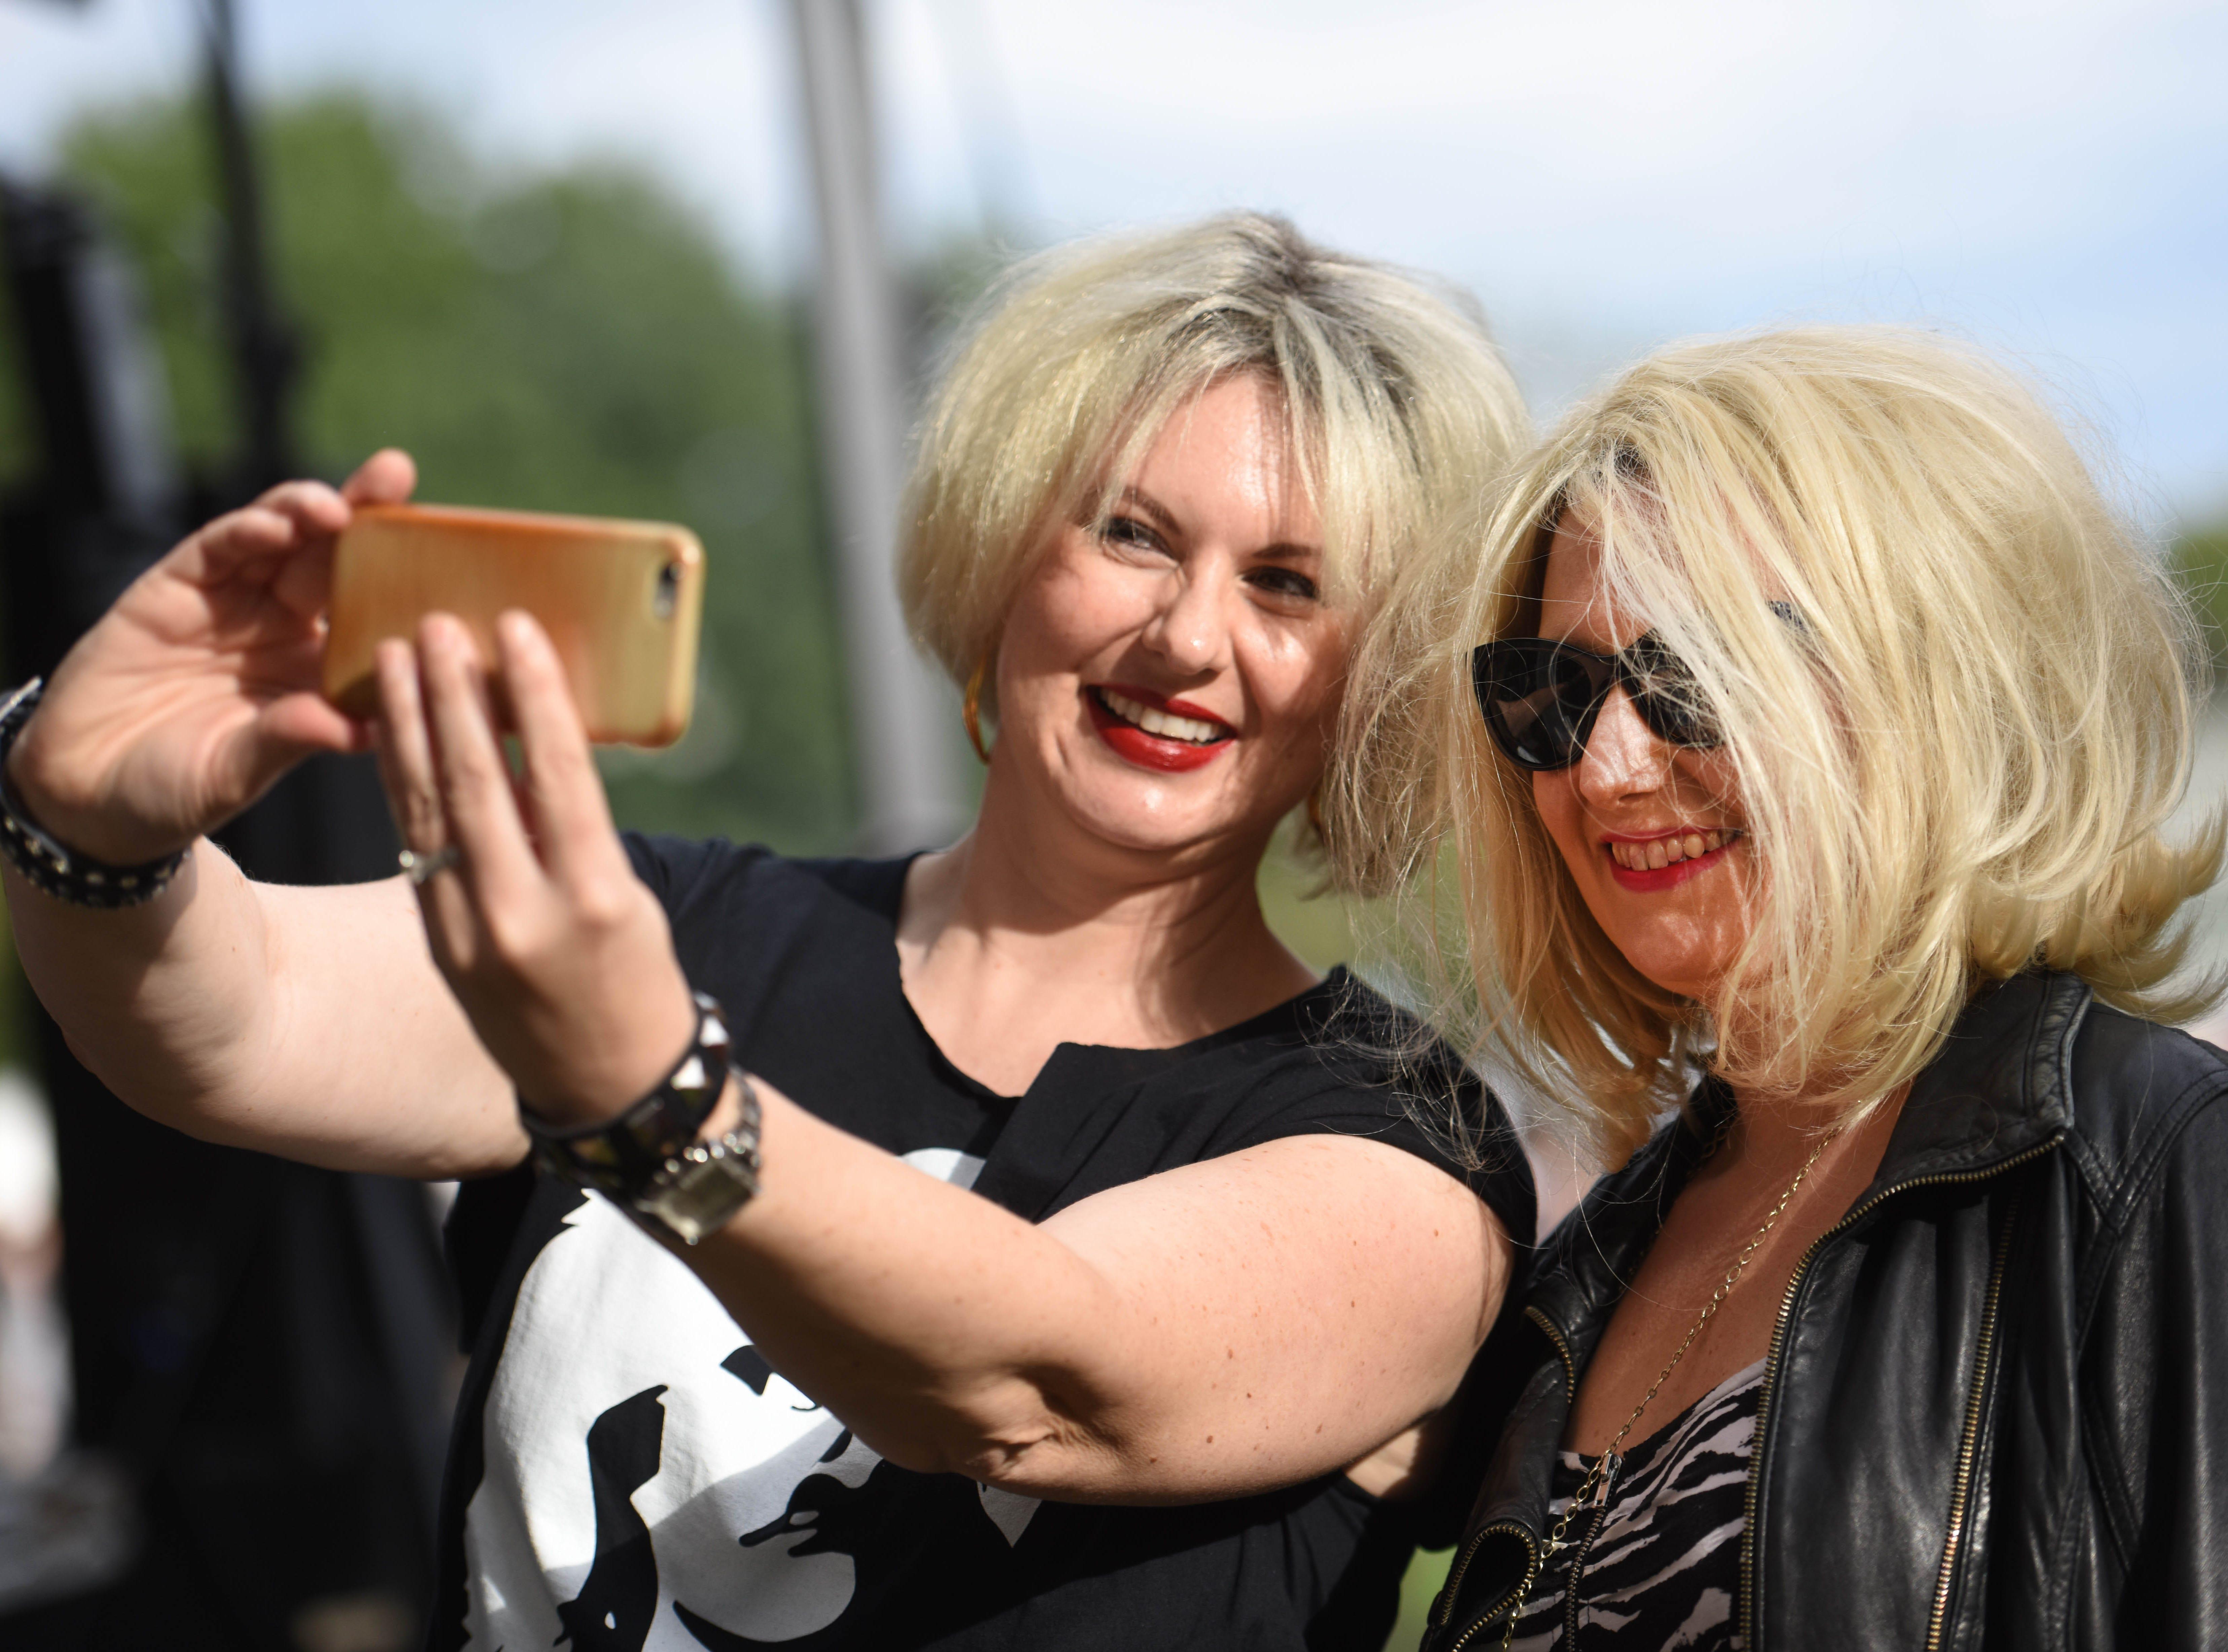 the two Blondie Lookalike contestants Adrienne Girard and Amber Mackey take a selfieHawthorne Day -Blondie Lookalike